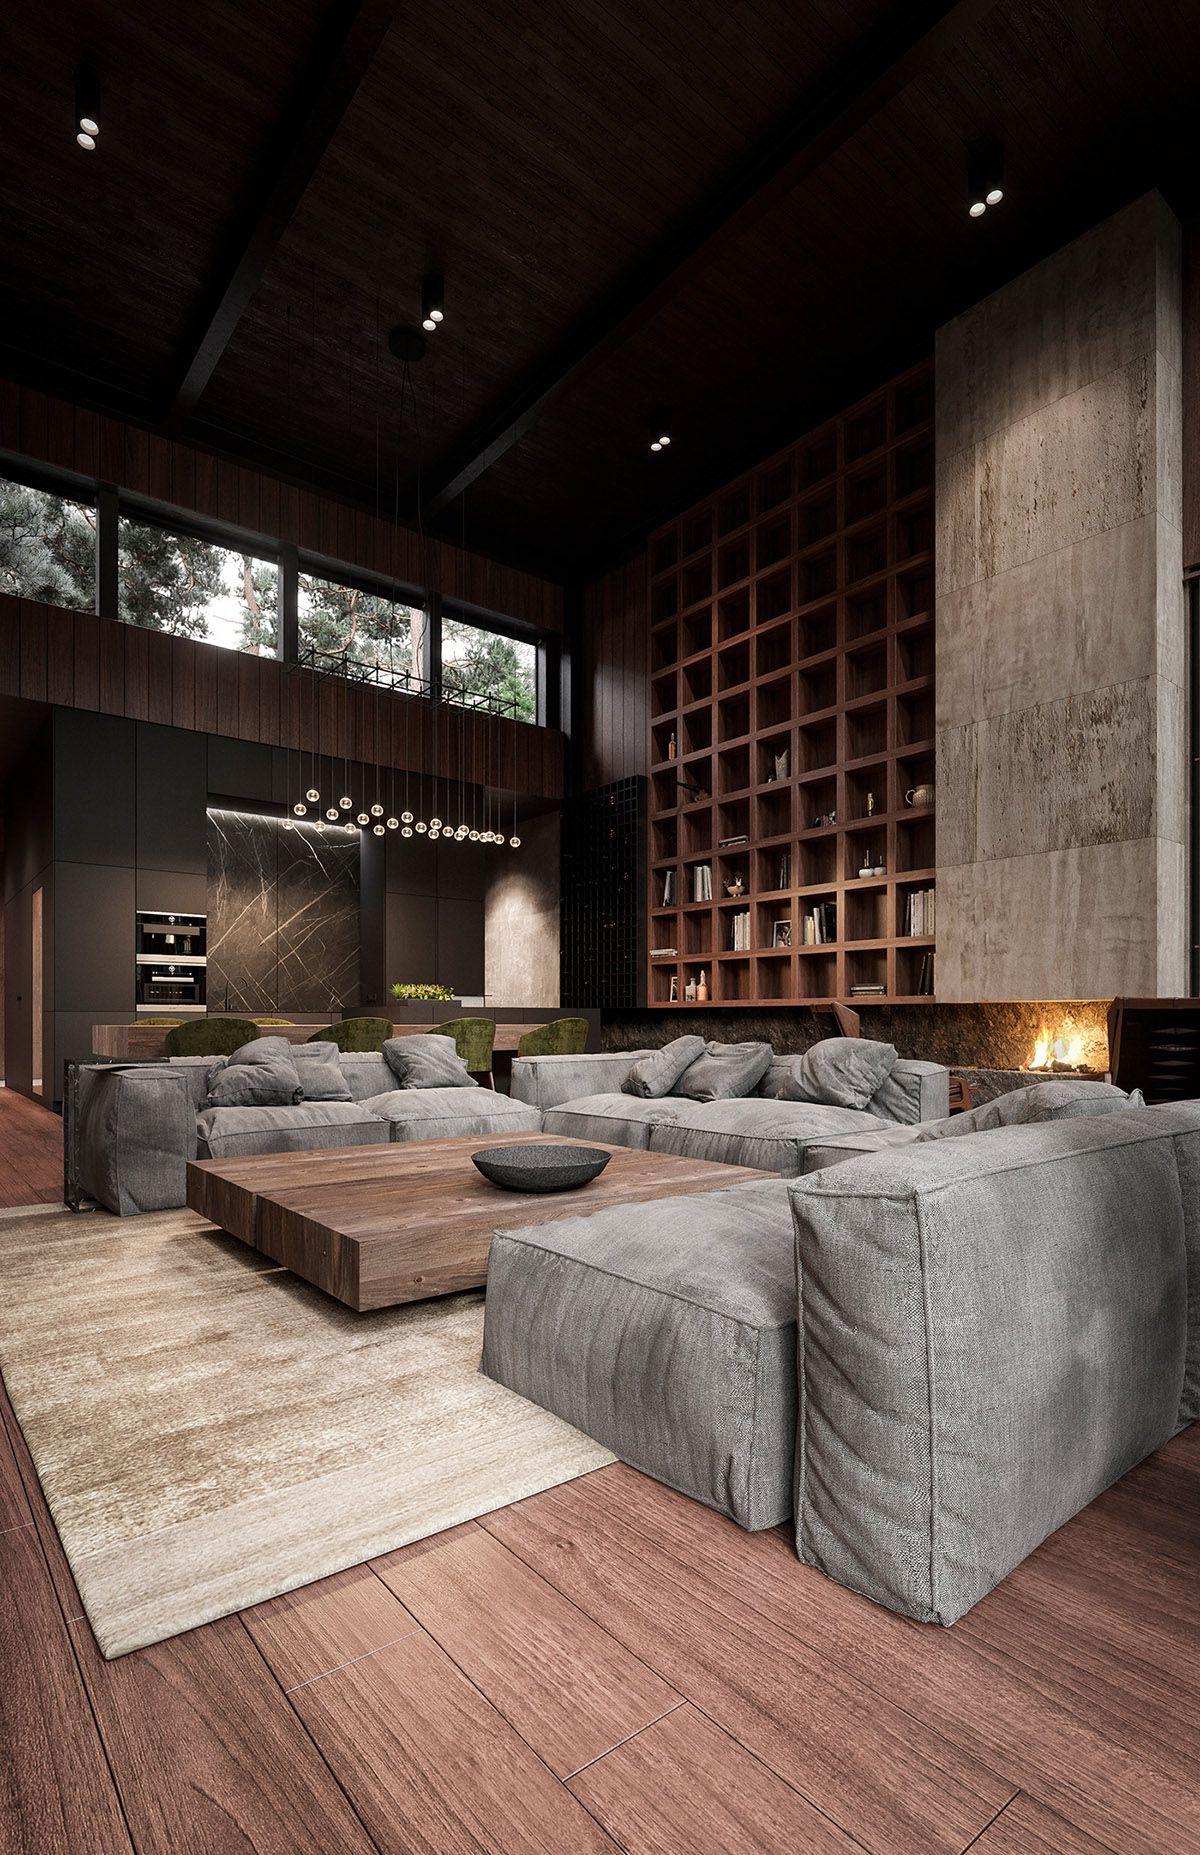 Rich Exquisite Modern Rustic Home Interior Minimalism